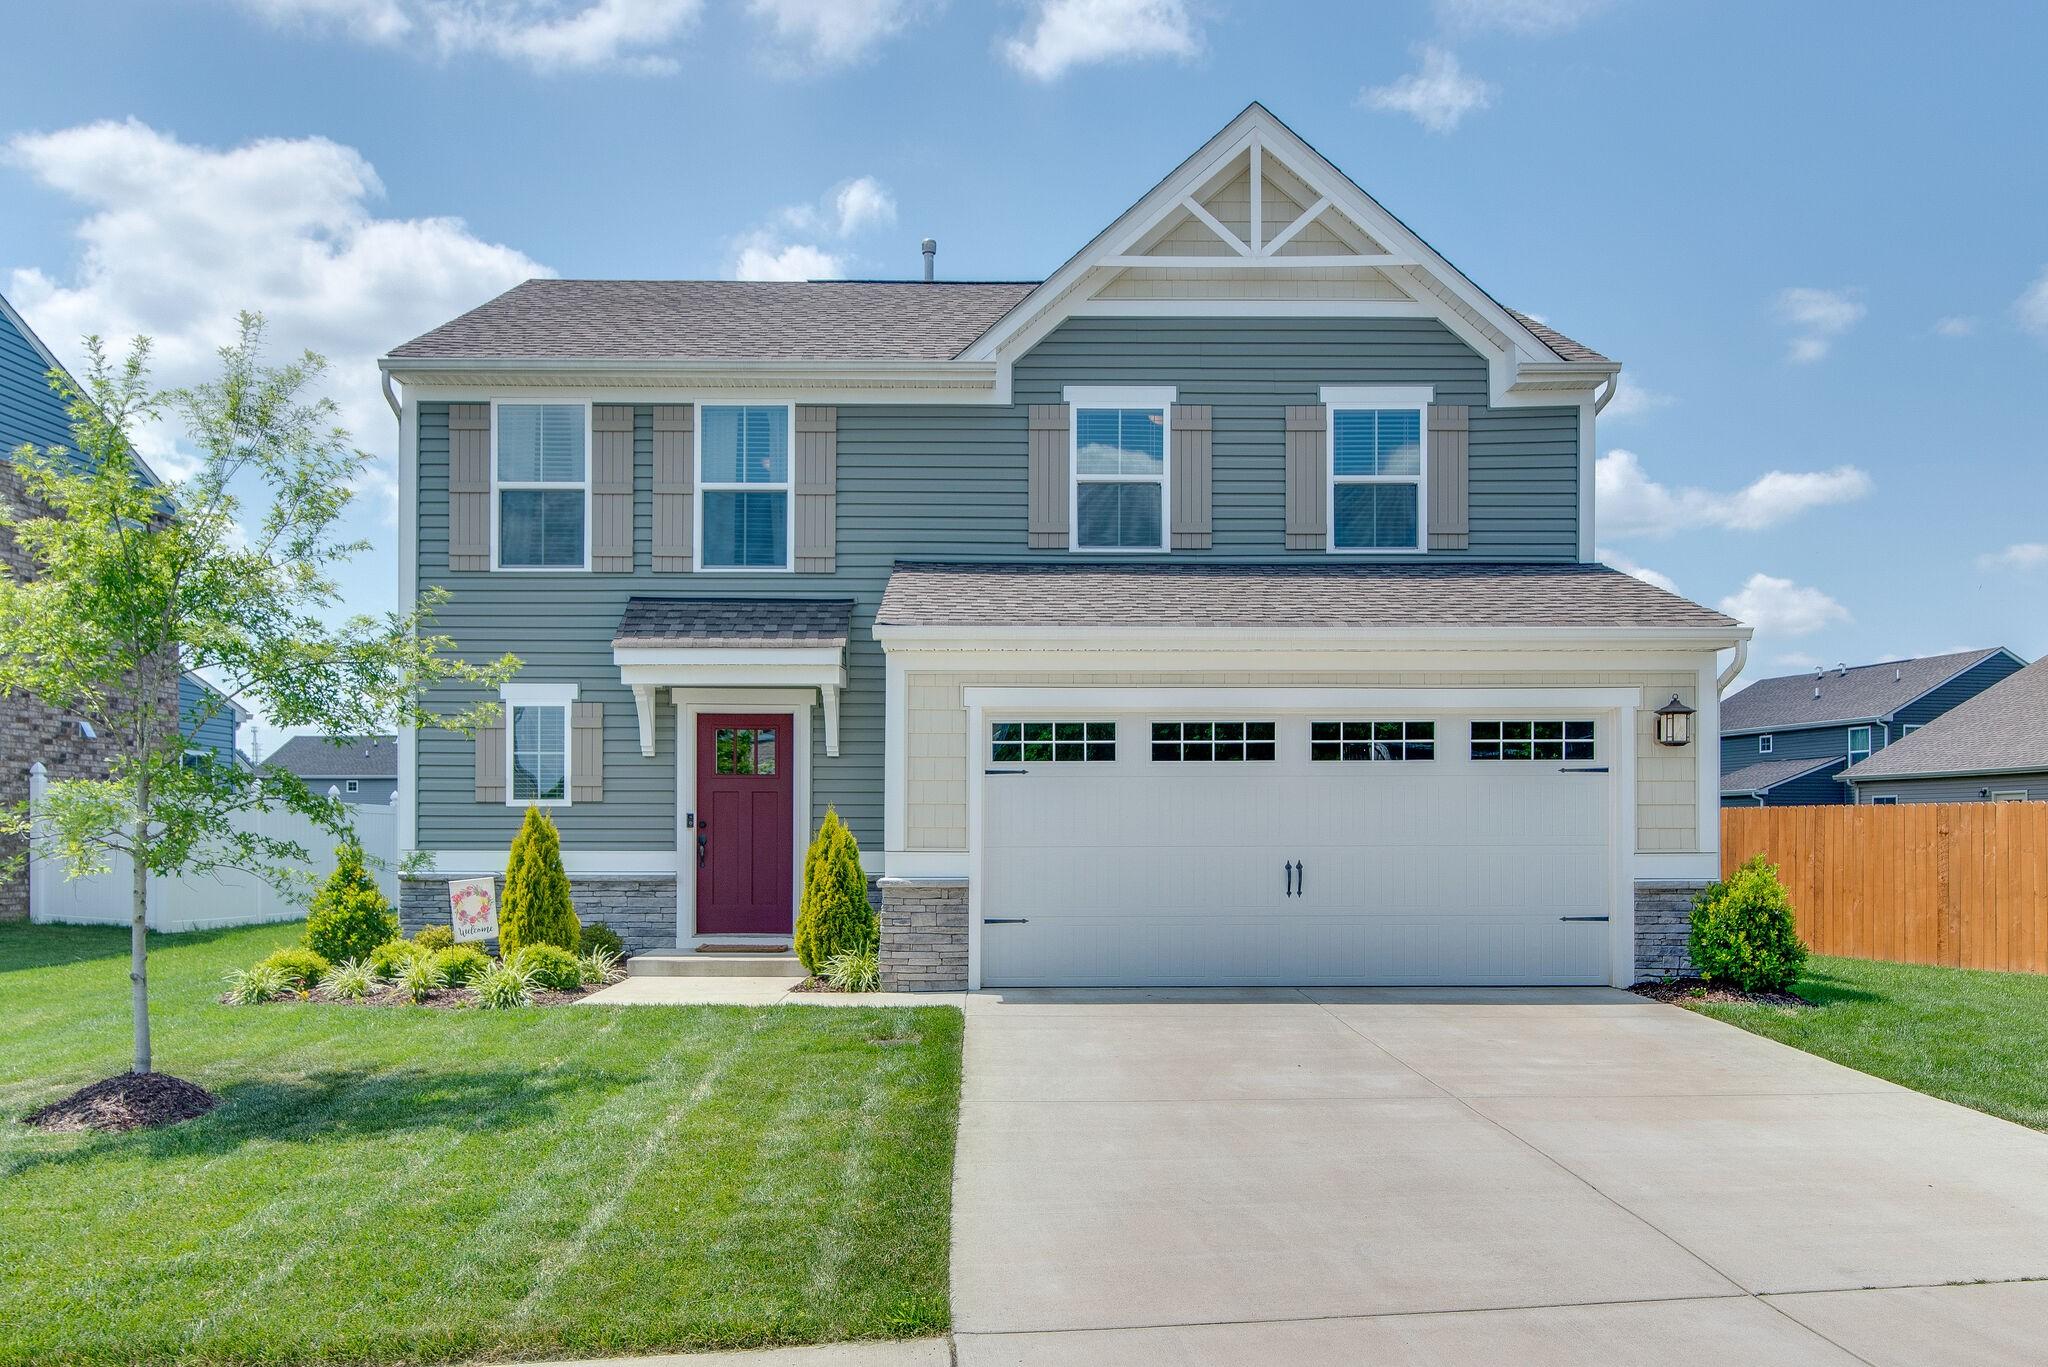 1704 Eastwick Ln Property Photo - Nashville, TN real estate listing